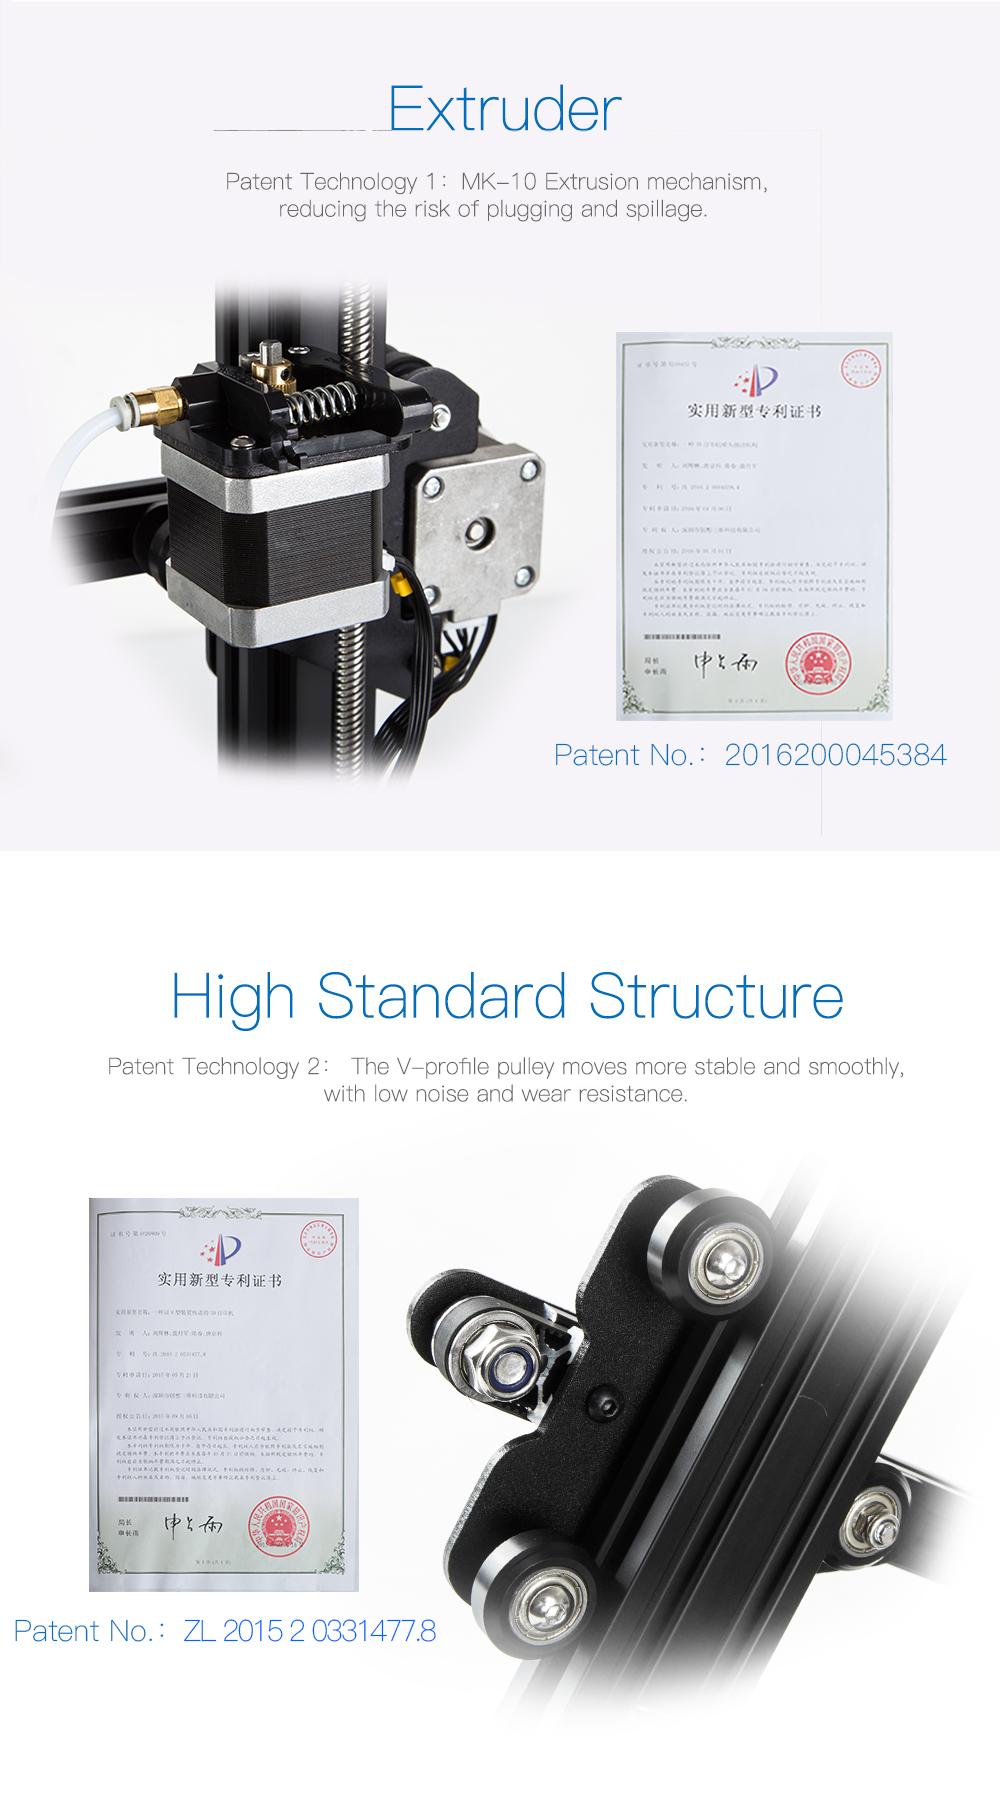 Creality3D Ender 3 Pro 3D-Drucker Bausatz - 220x220x250mm - MK-10 Extruder - V-Slot Profilführungen